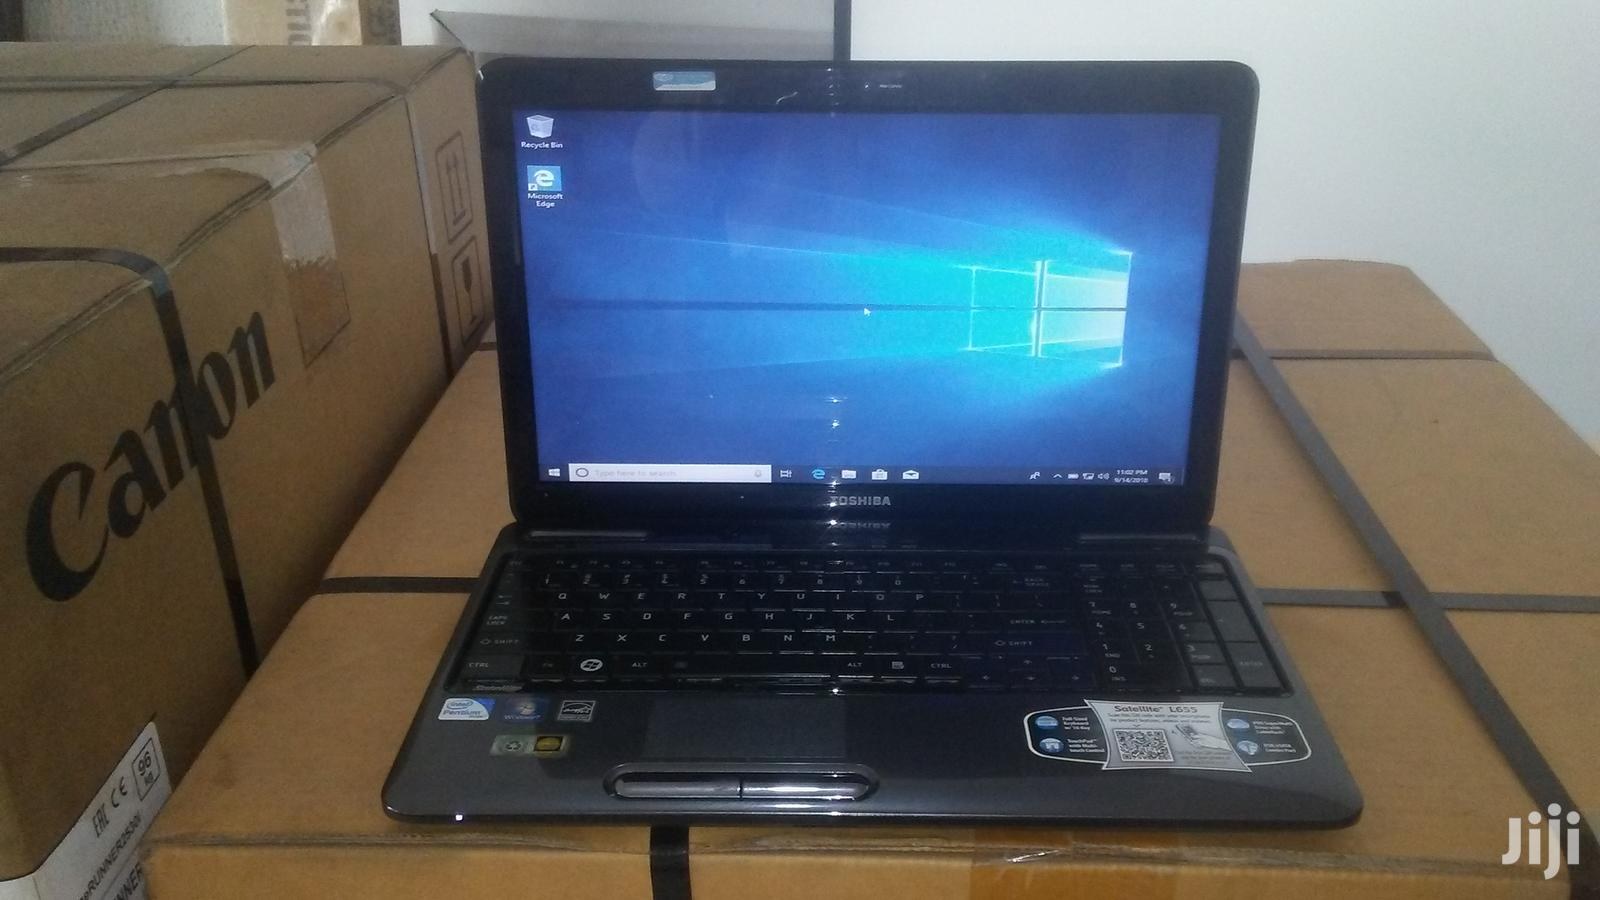 Laptop Toshiba Satellite L555 3GB Intel Pentium HDD 320GB